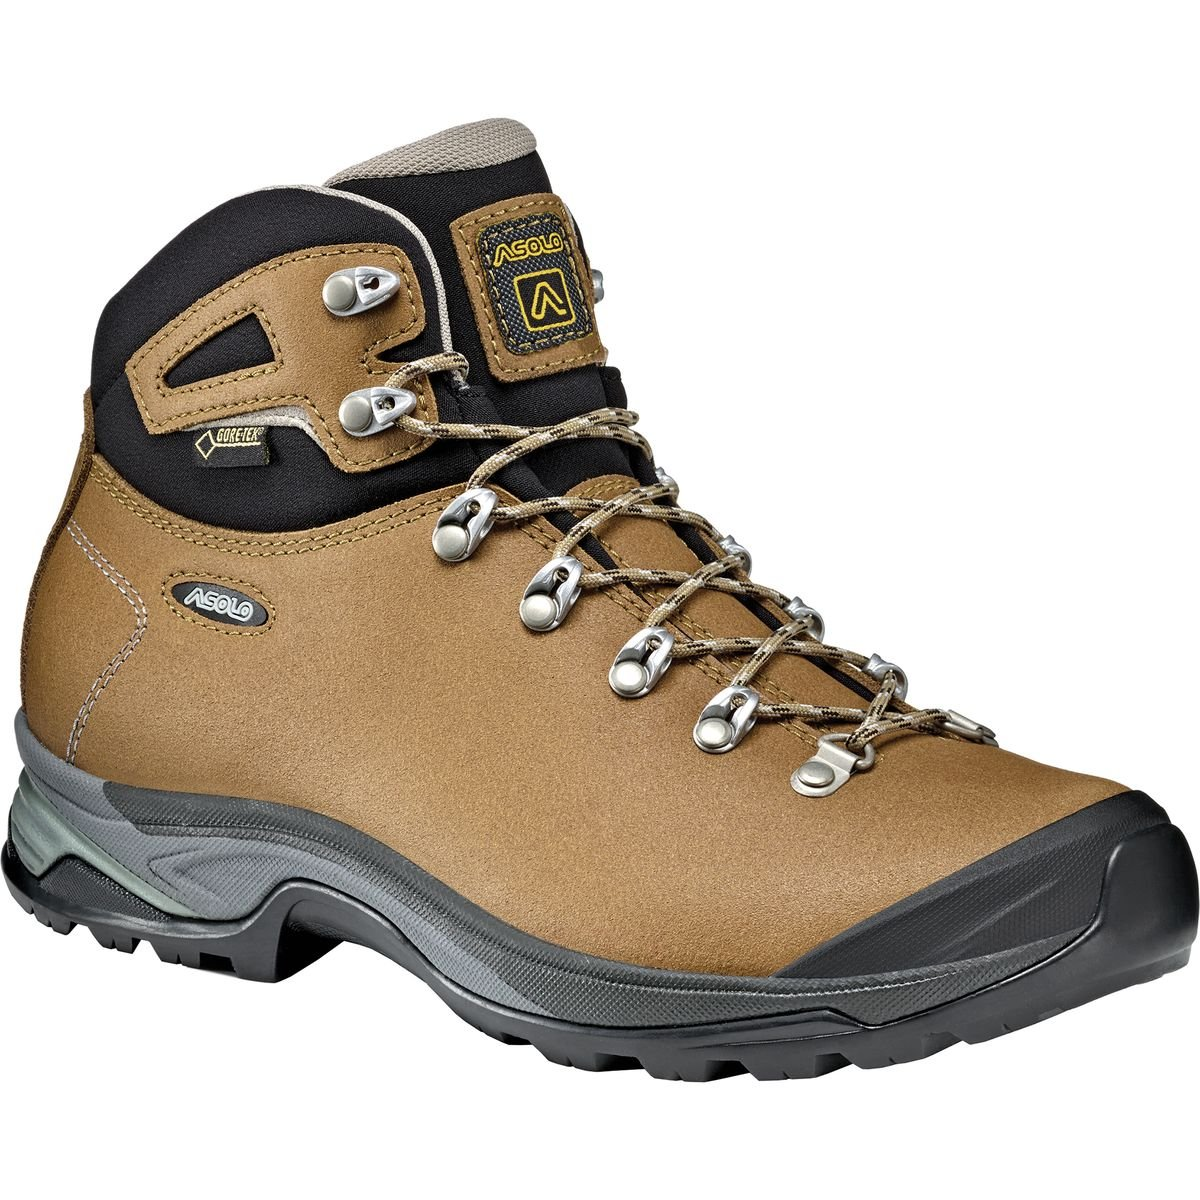 Asolo Thyrus GV Boot - Women's B01J4D4OFK 9|Brown Sugar/Black